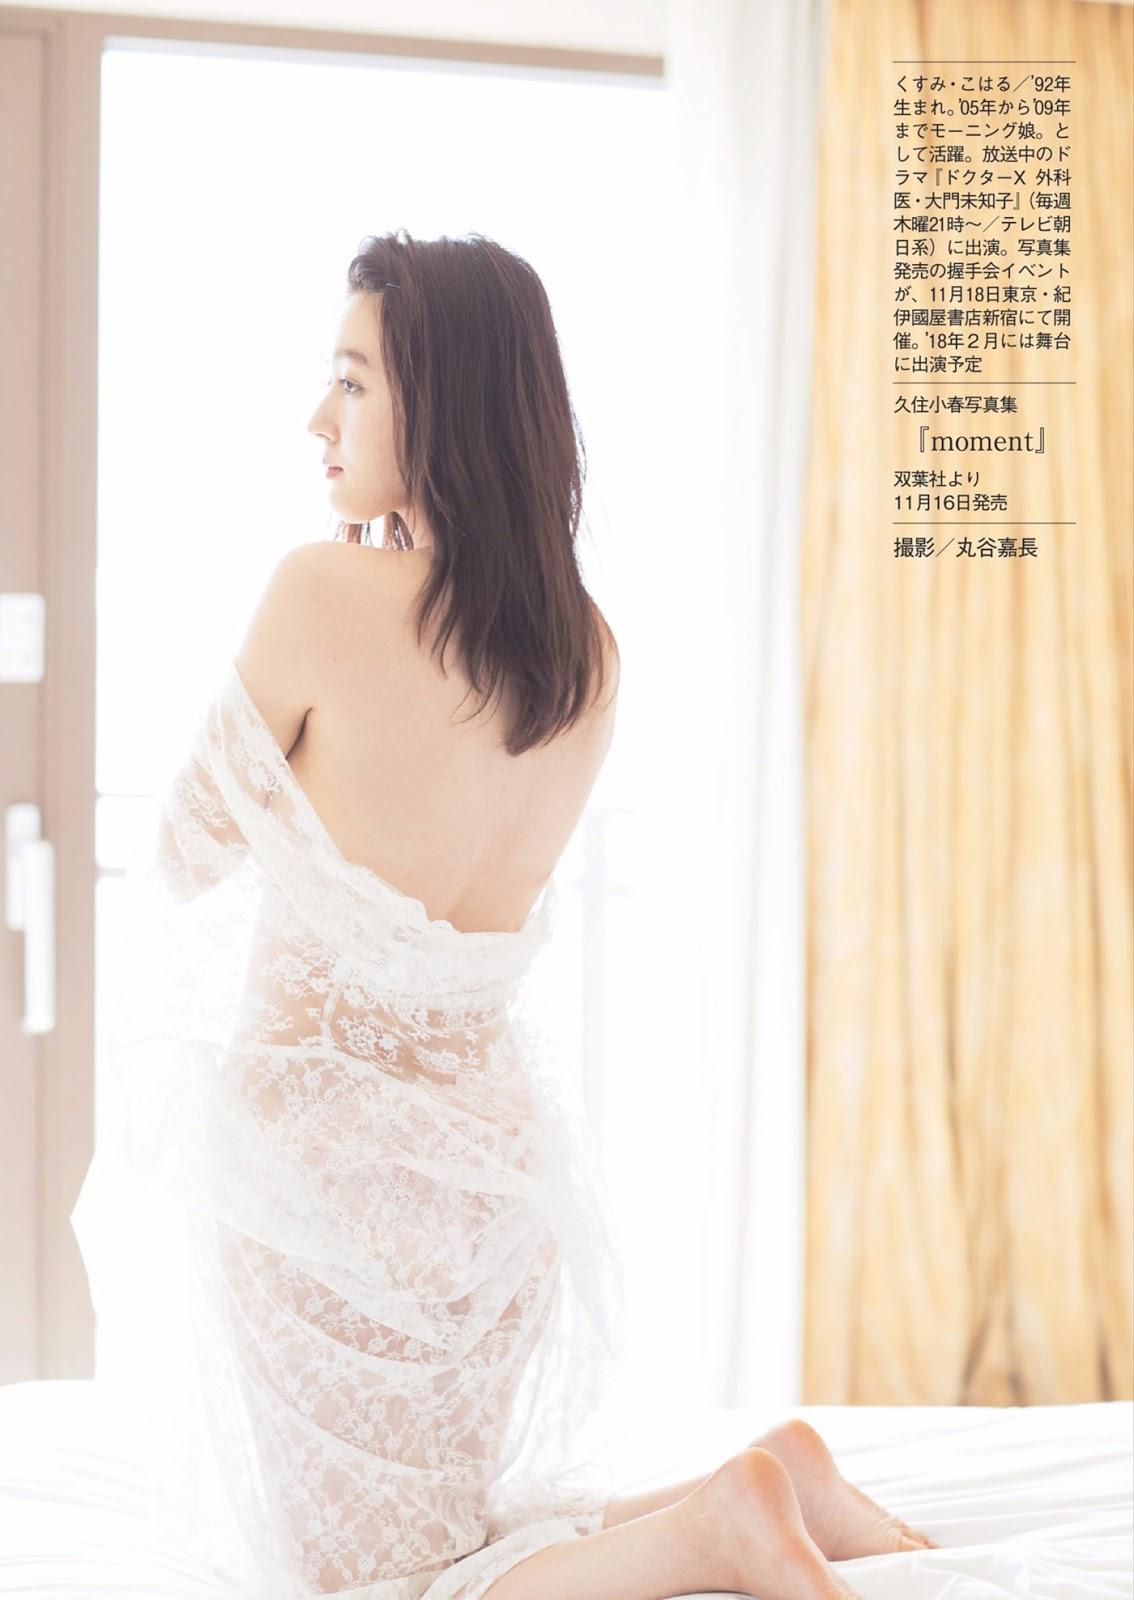 Koharu Kusumi 久住小春, FLASH 電子版 2017.11.14 (フラッシュ 2017年11月14日号)